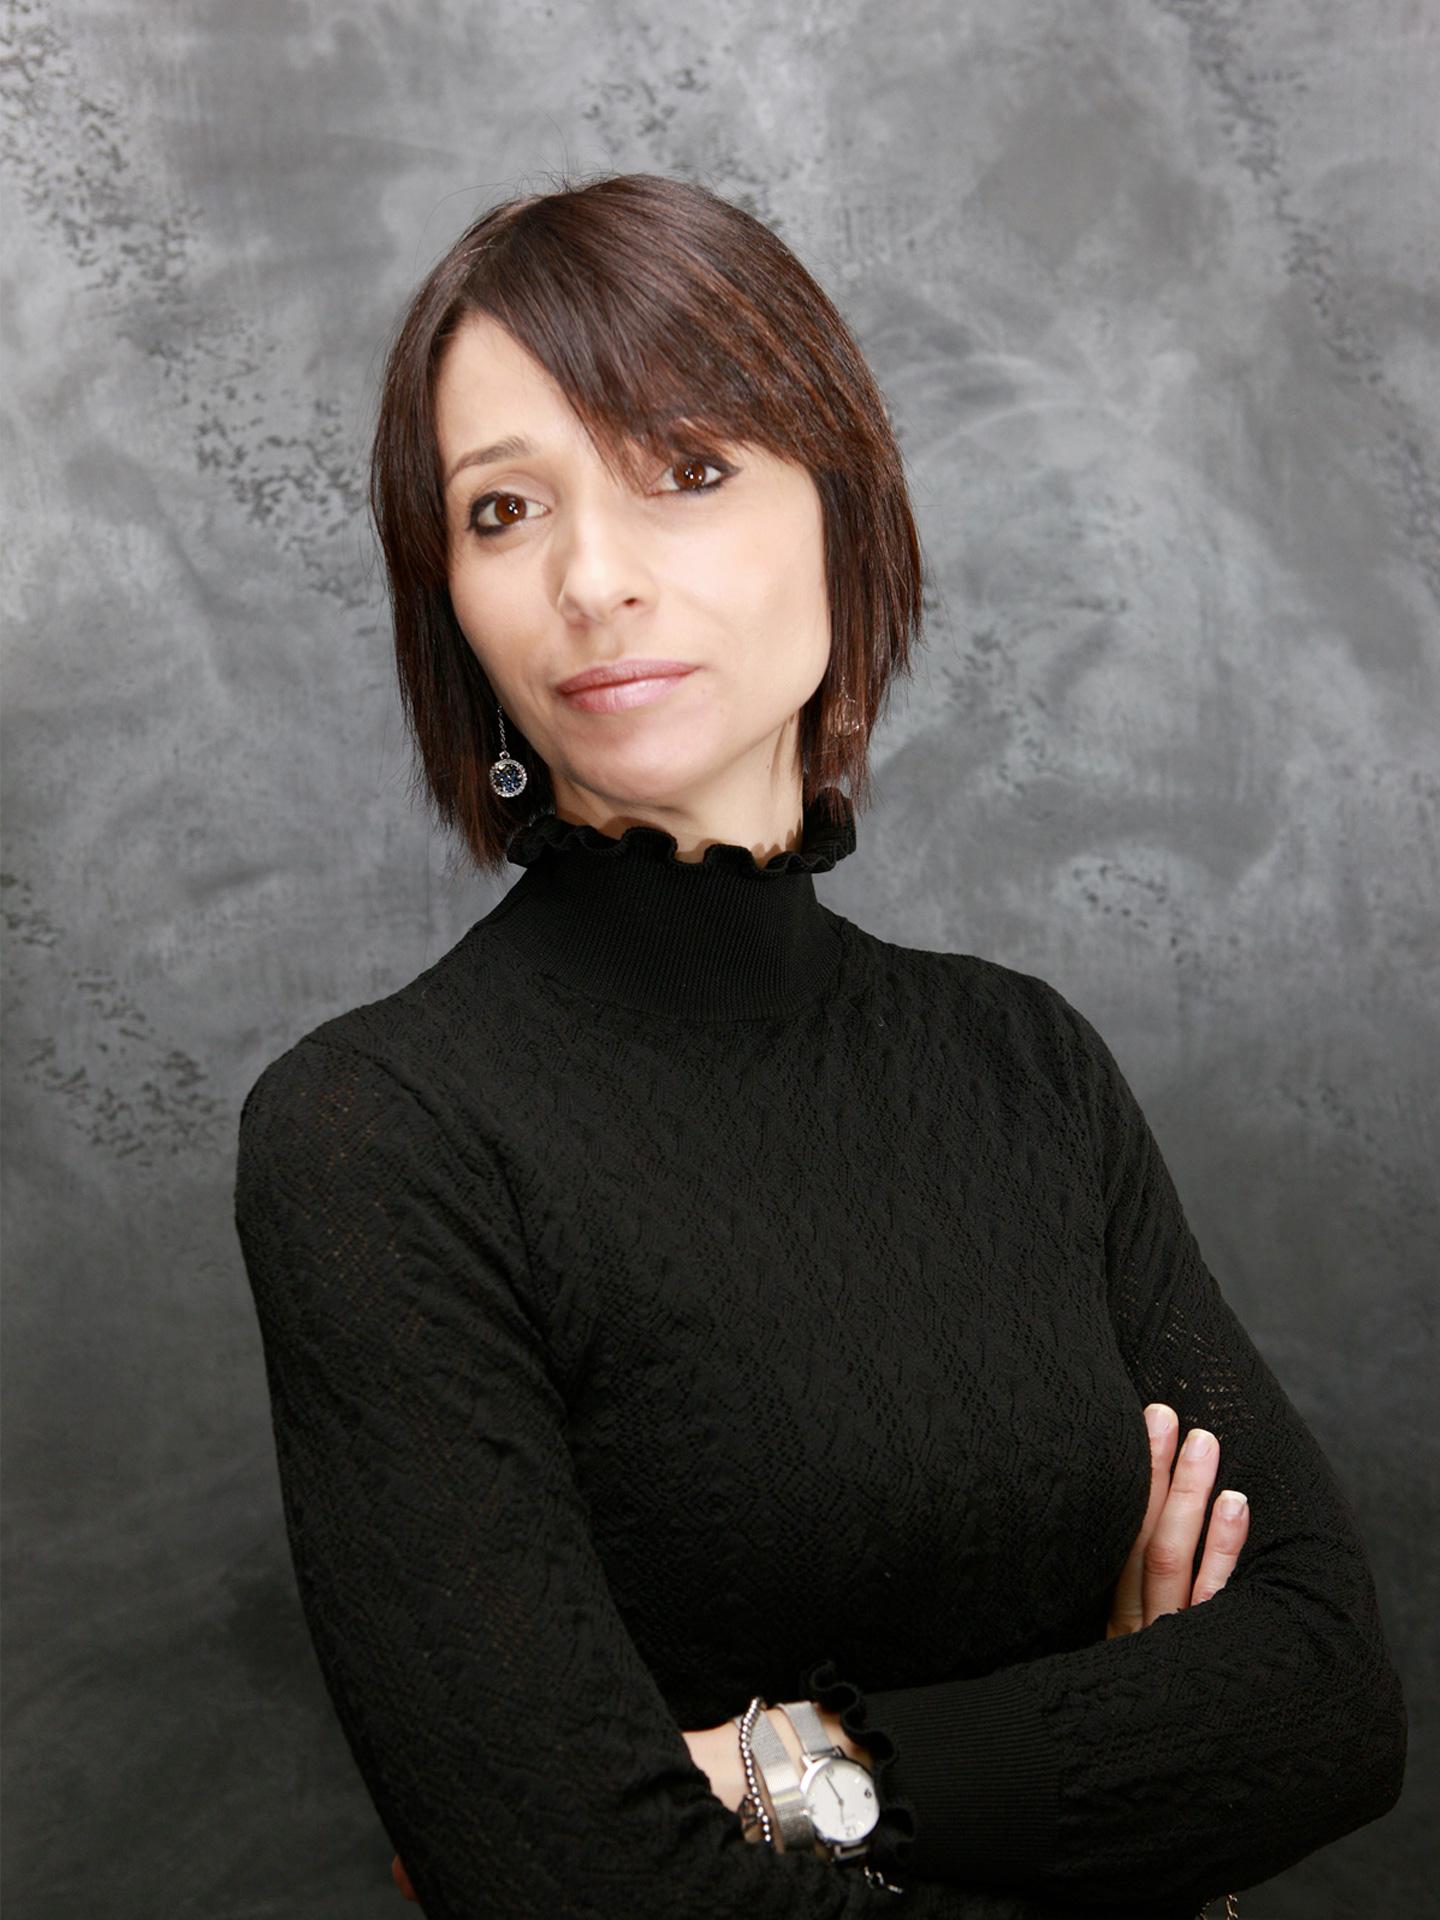 Fabiola Cristini